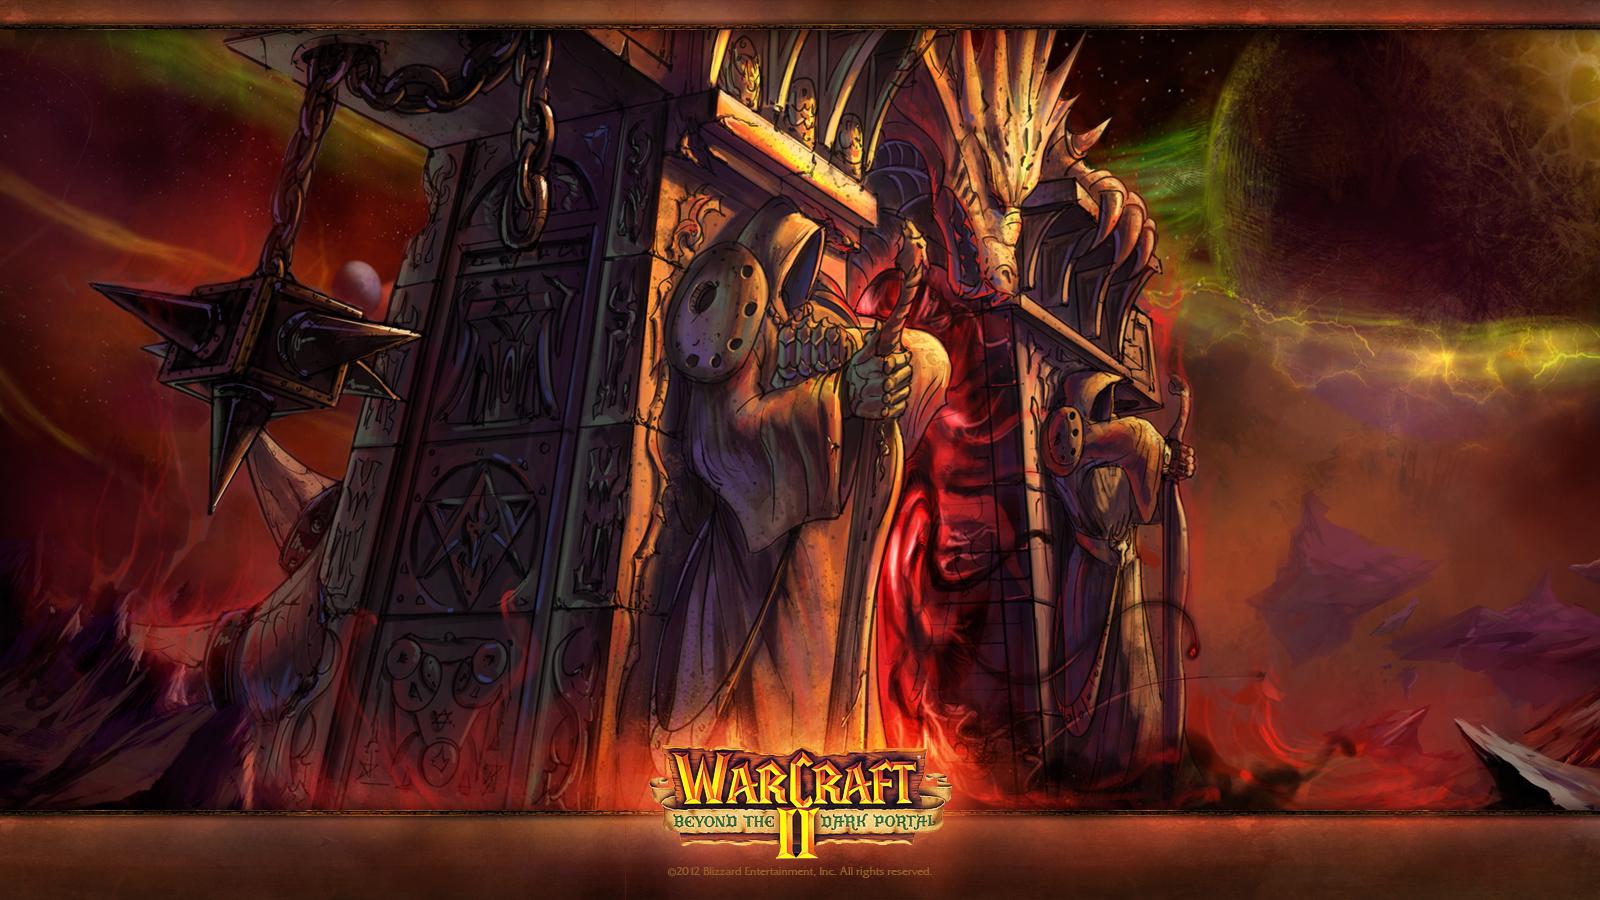 World Of Warcraft The Dark Portal Uhd 4k Wallpaper: Bitter's Blog • Warcraft II: The Dark Portal